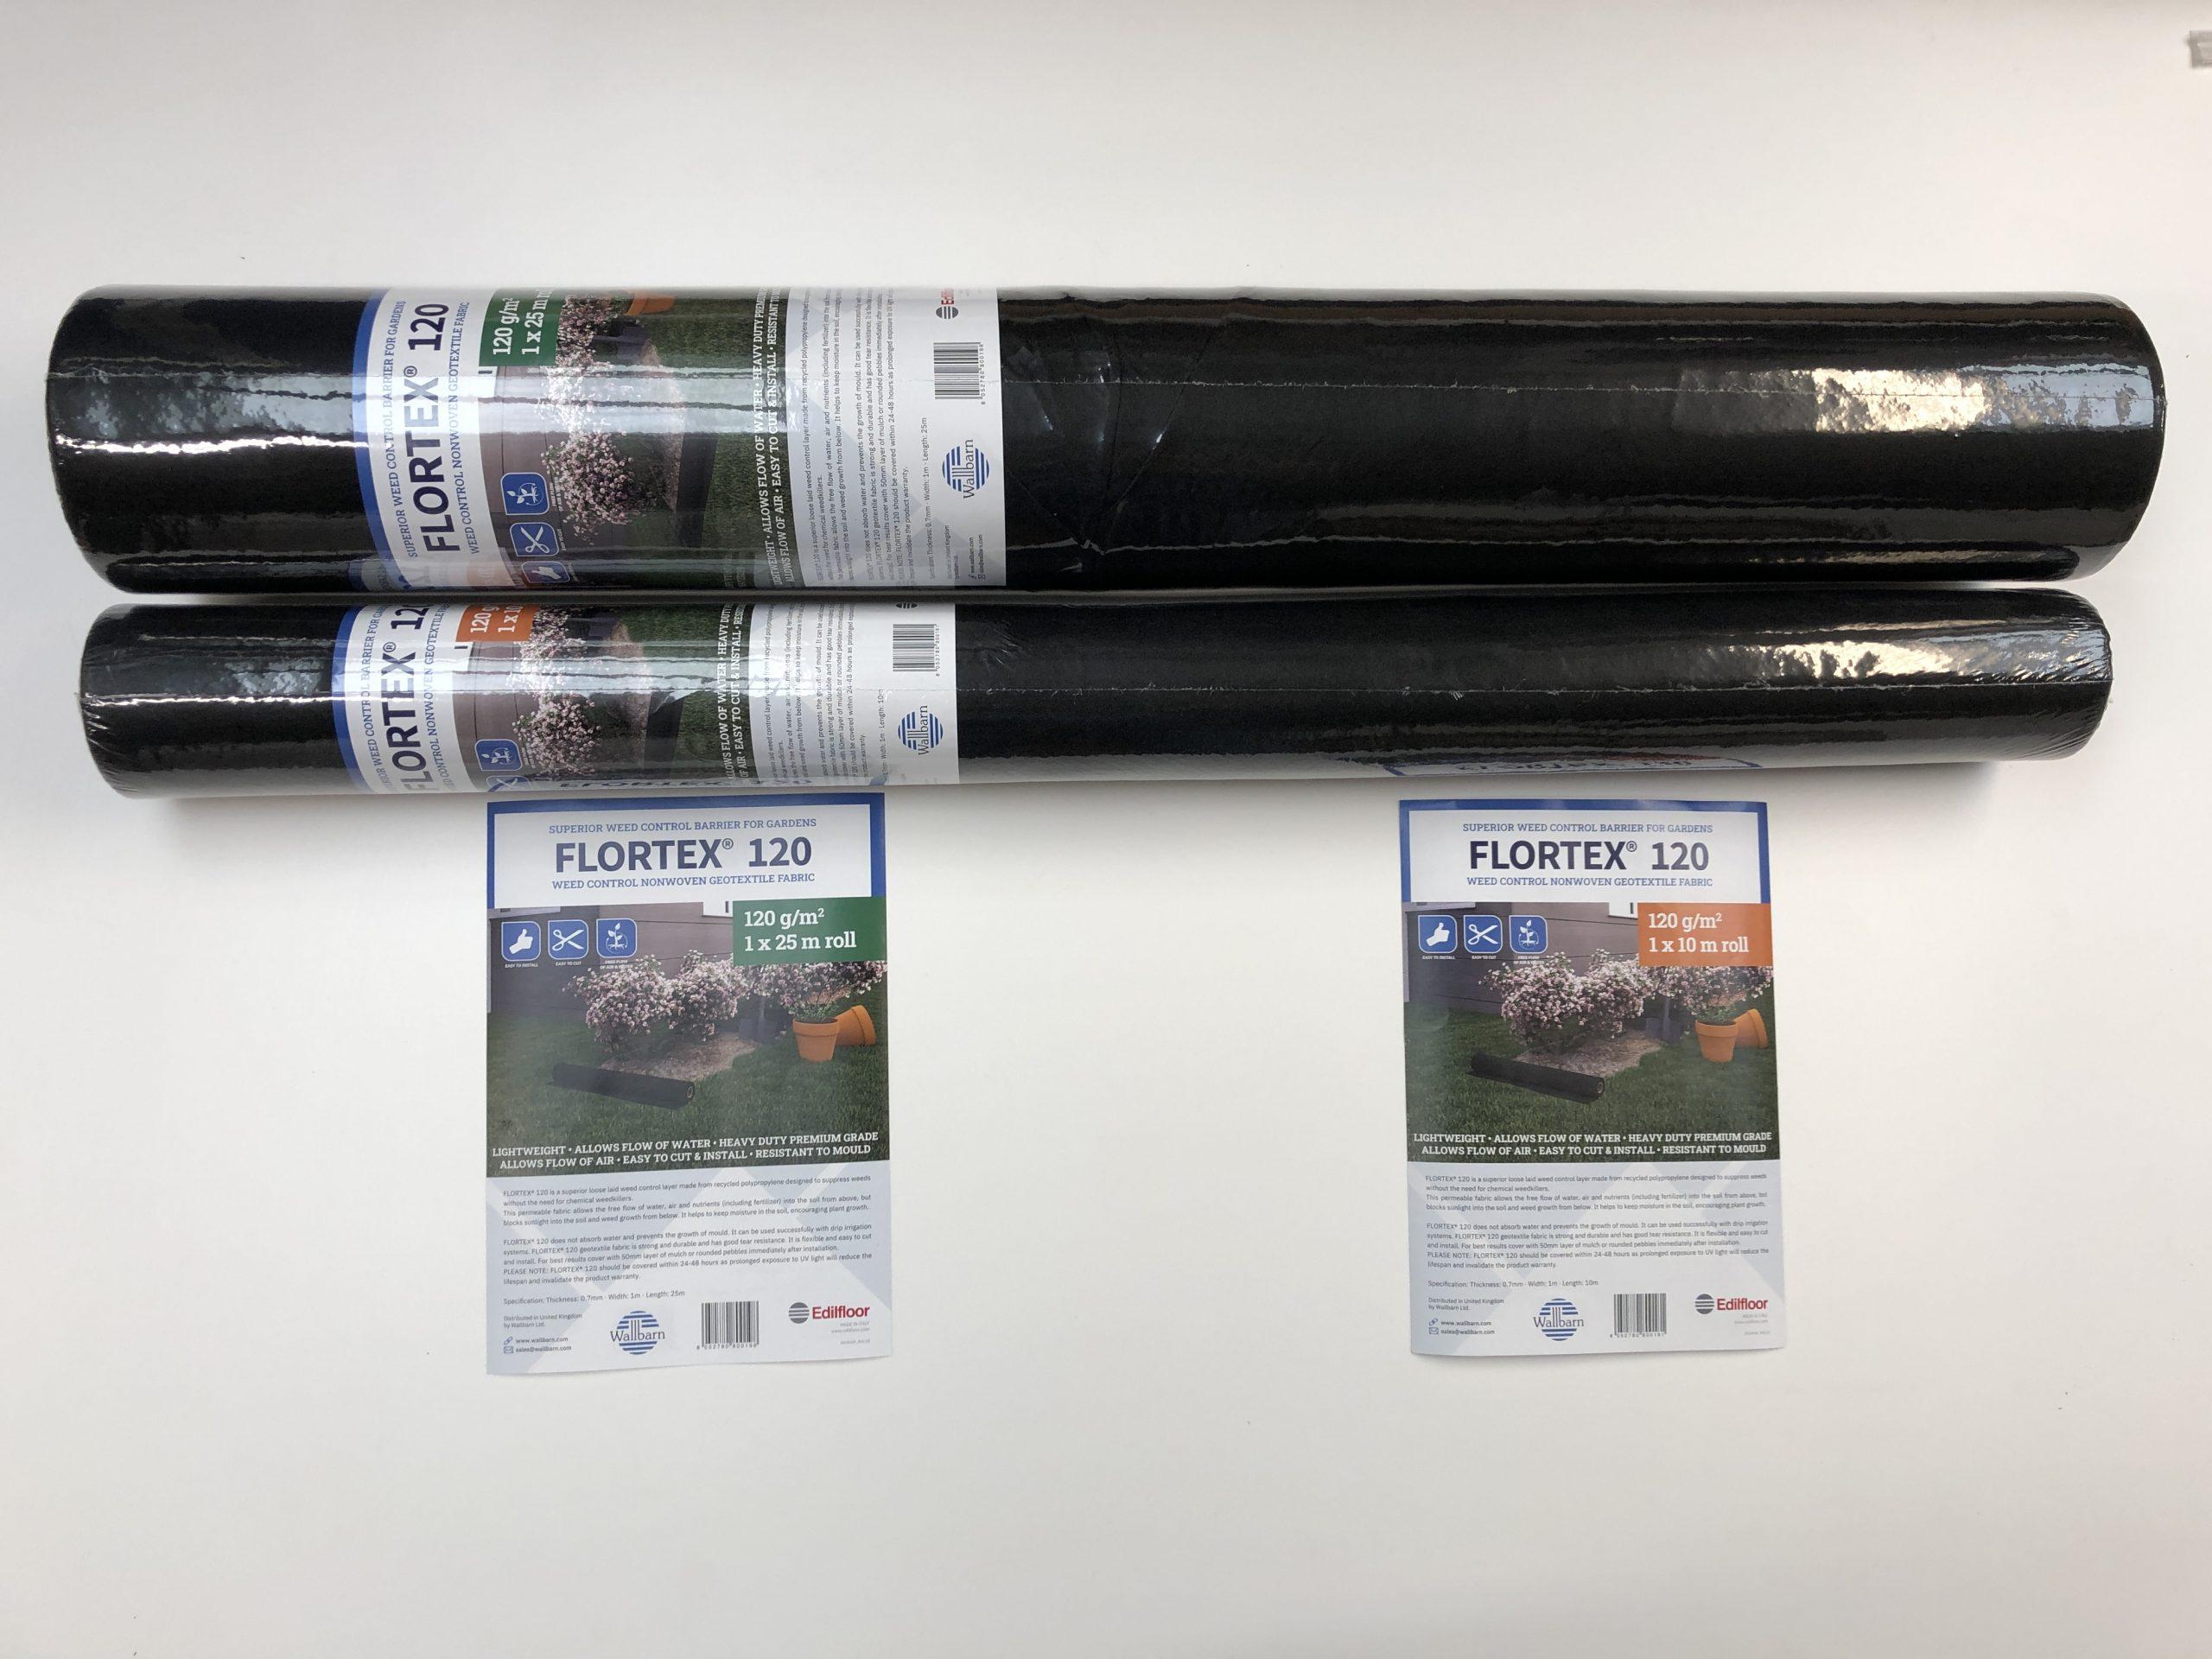 Flortex weed control fabric roll size